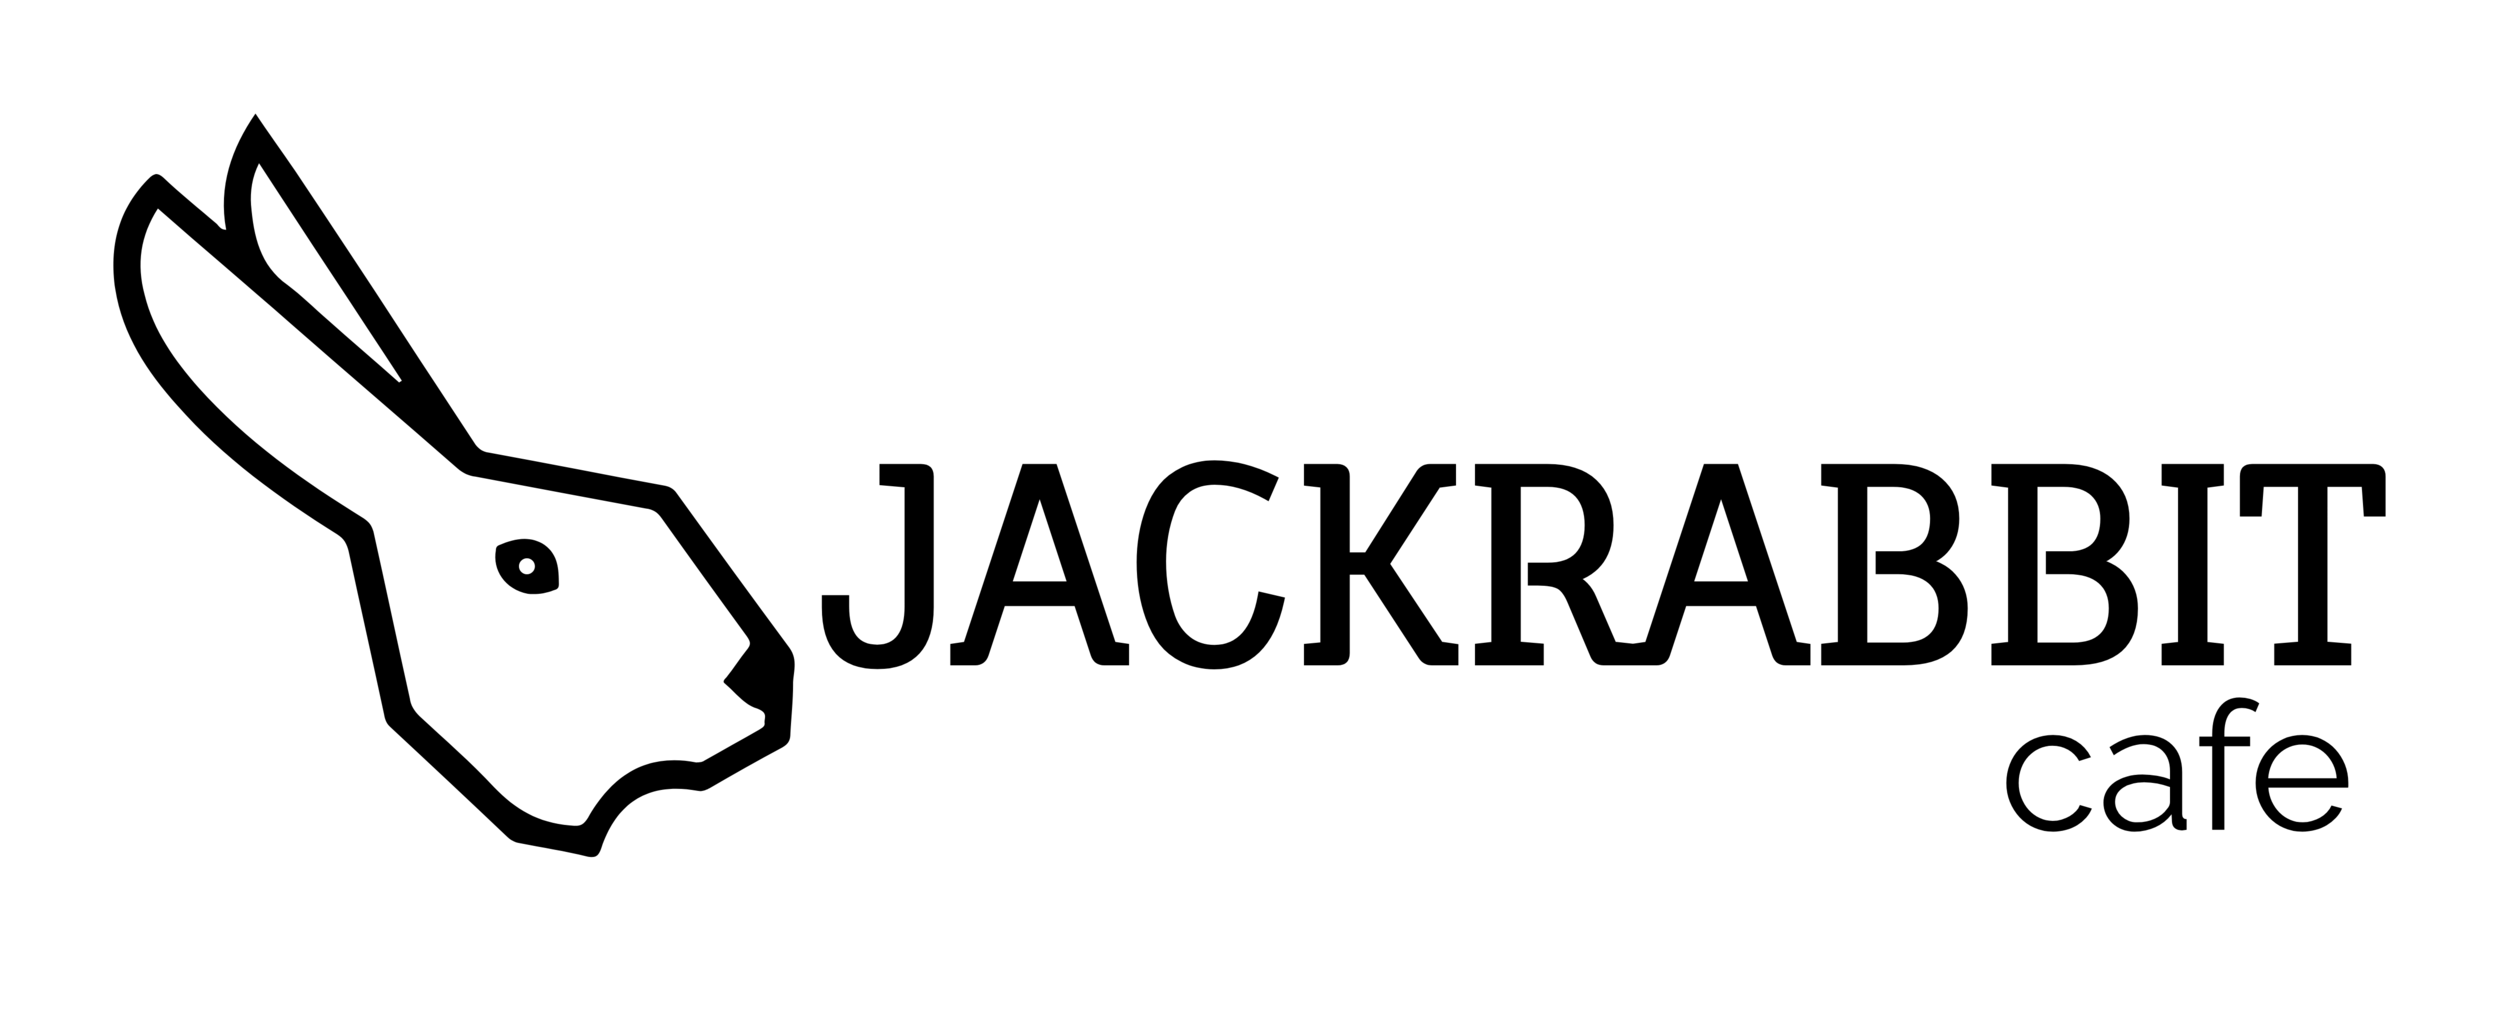 JACKRABBIT-logo-black (1).png